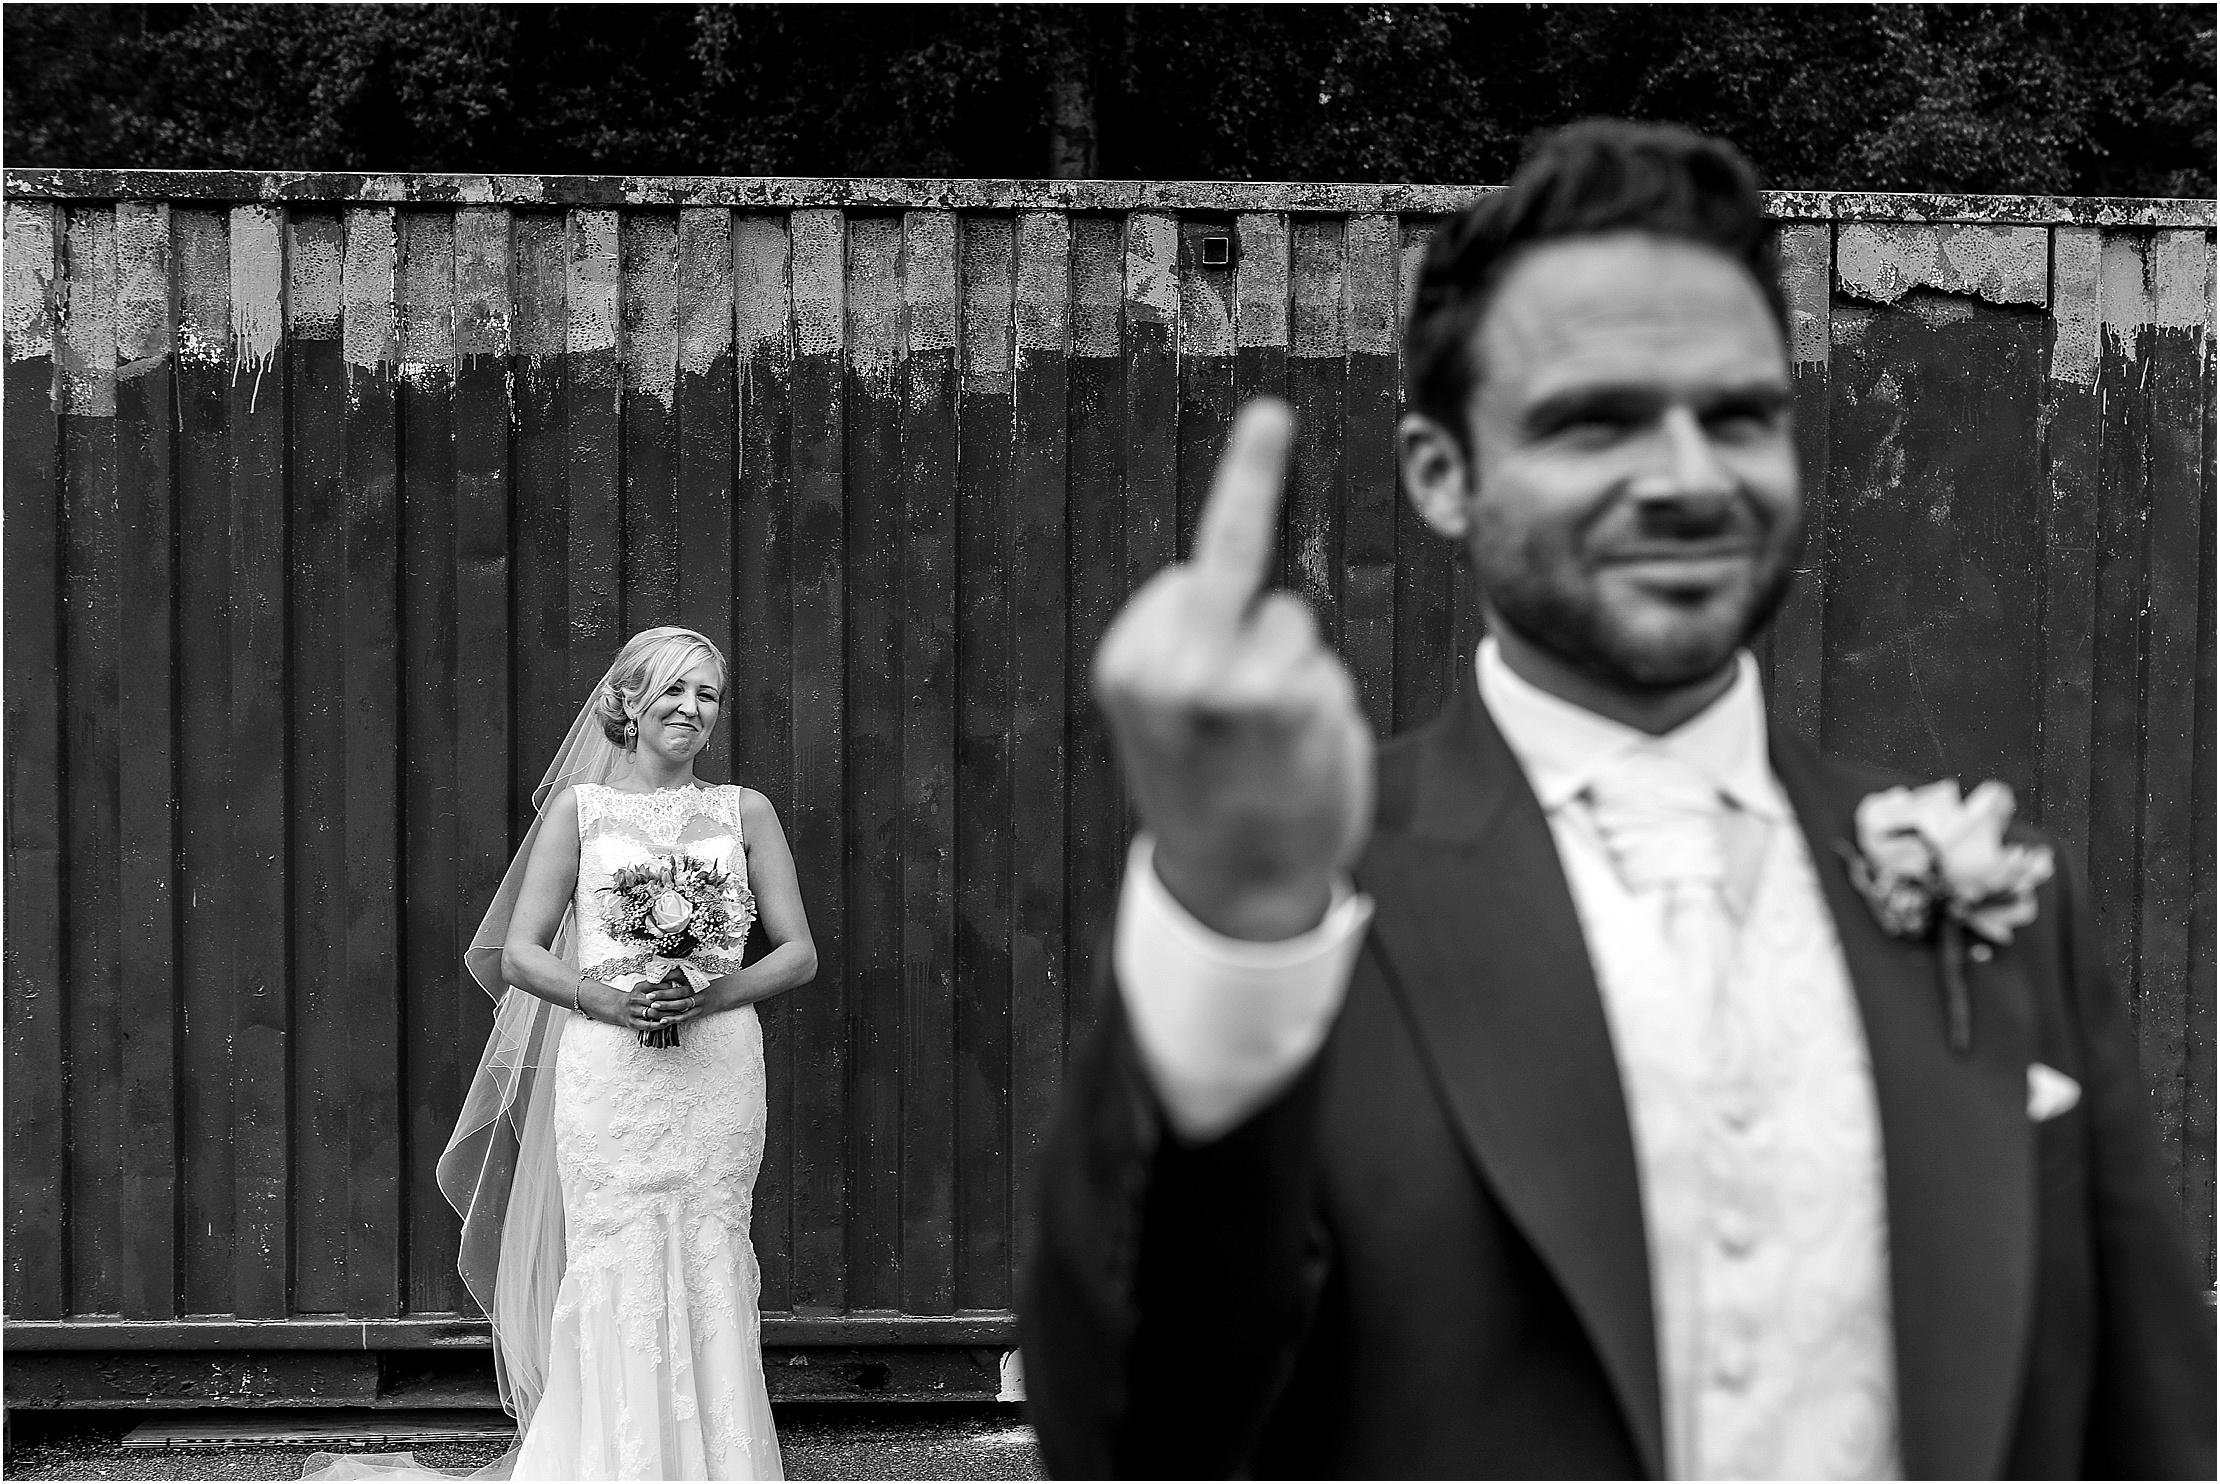 staining-lodge-wedding-088.jpg